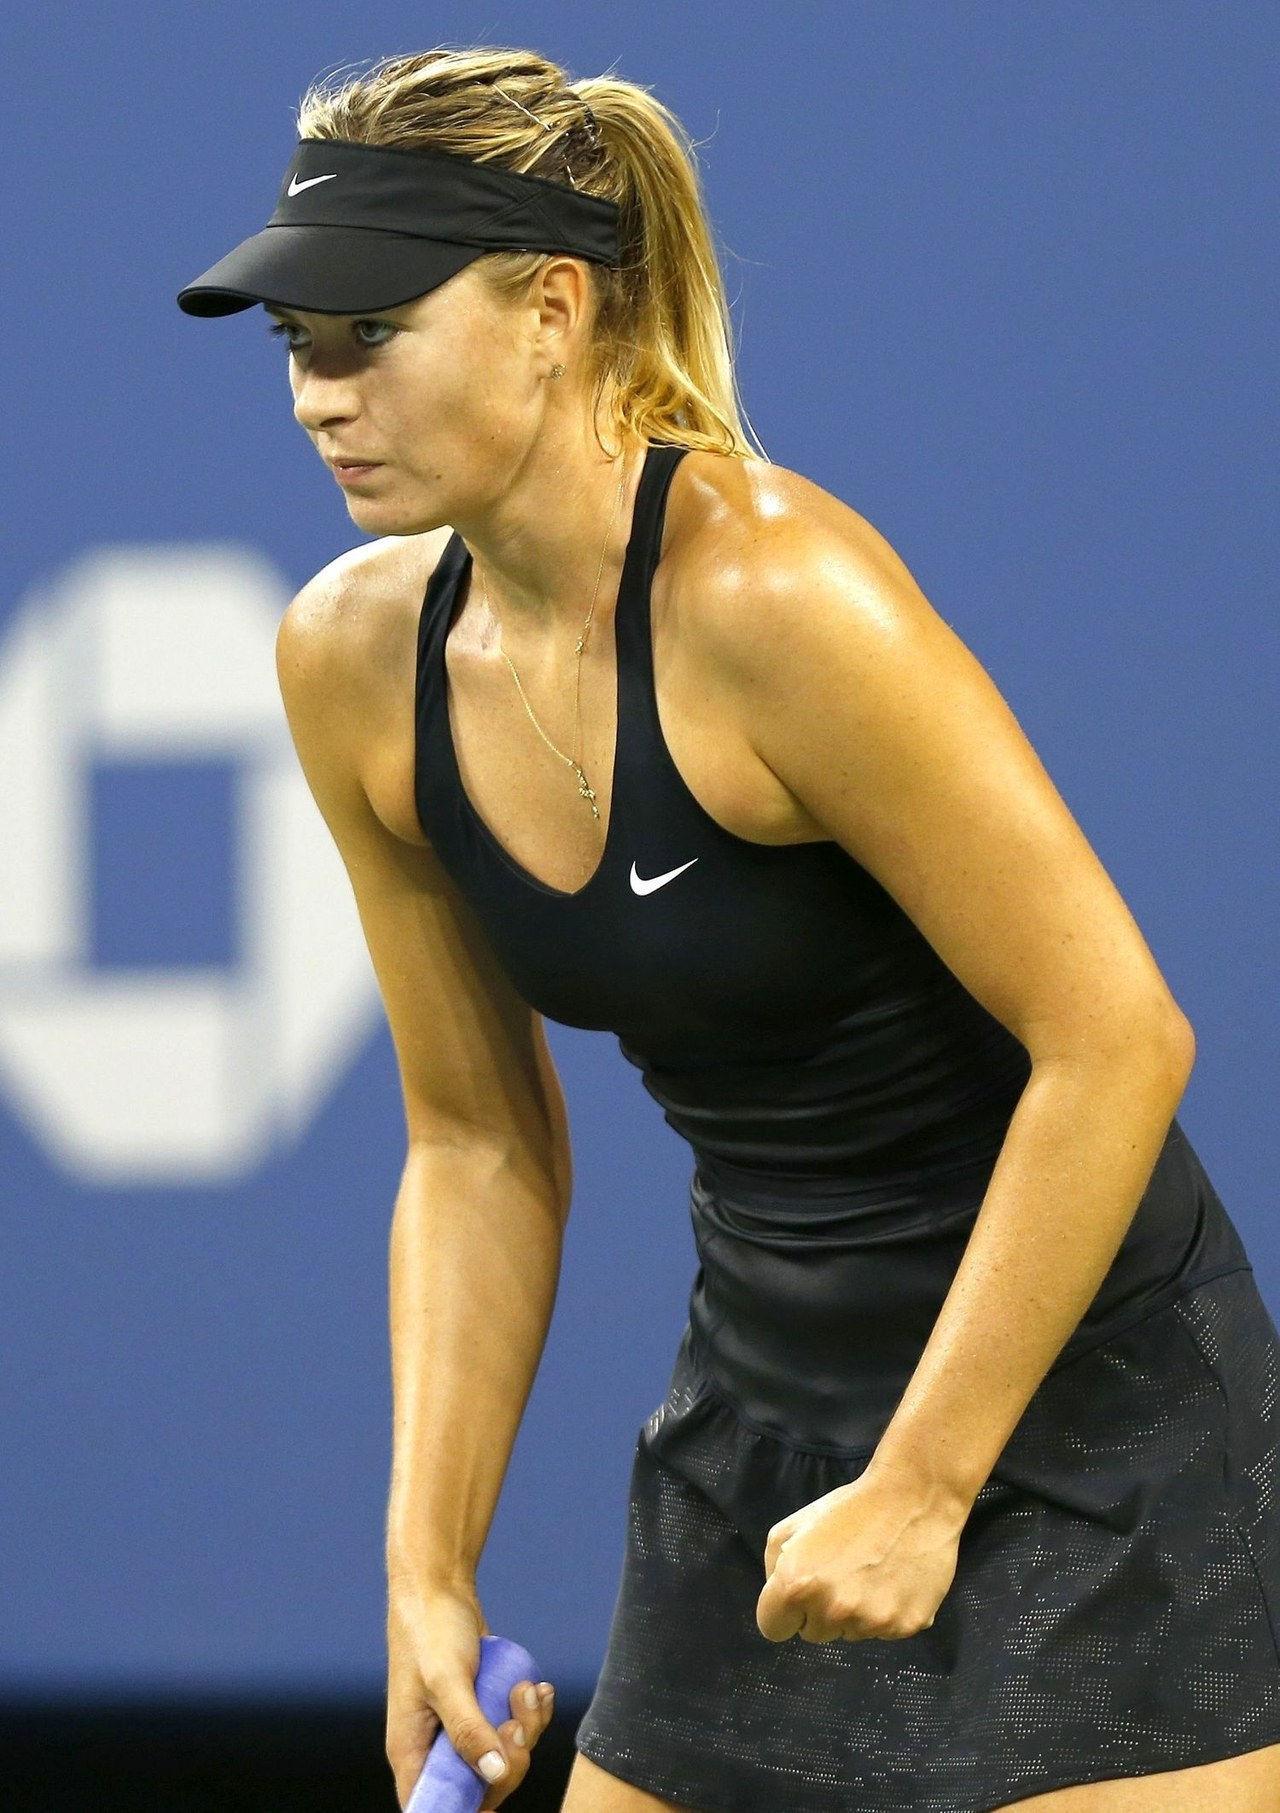 sharapova tennis dress